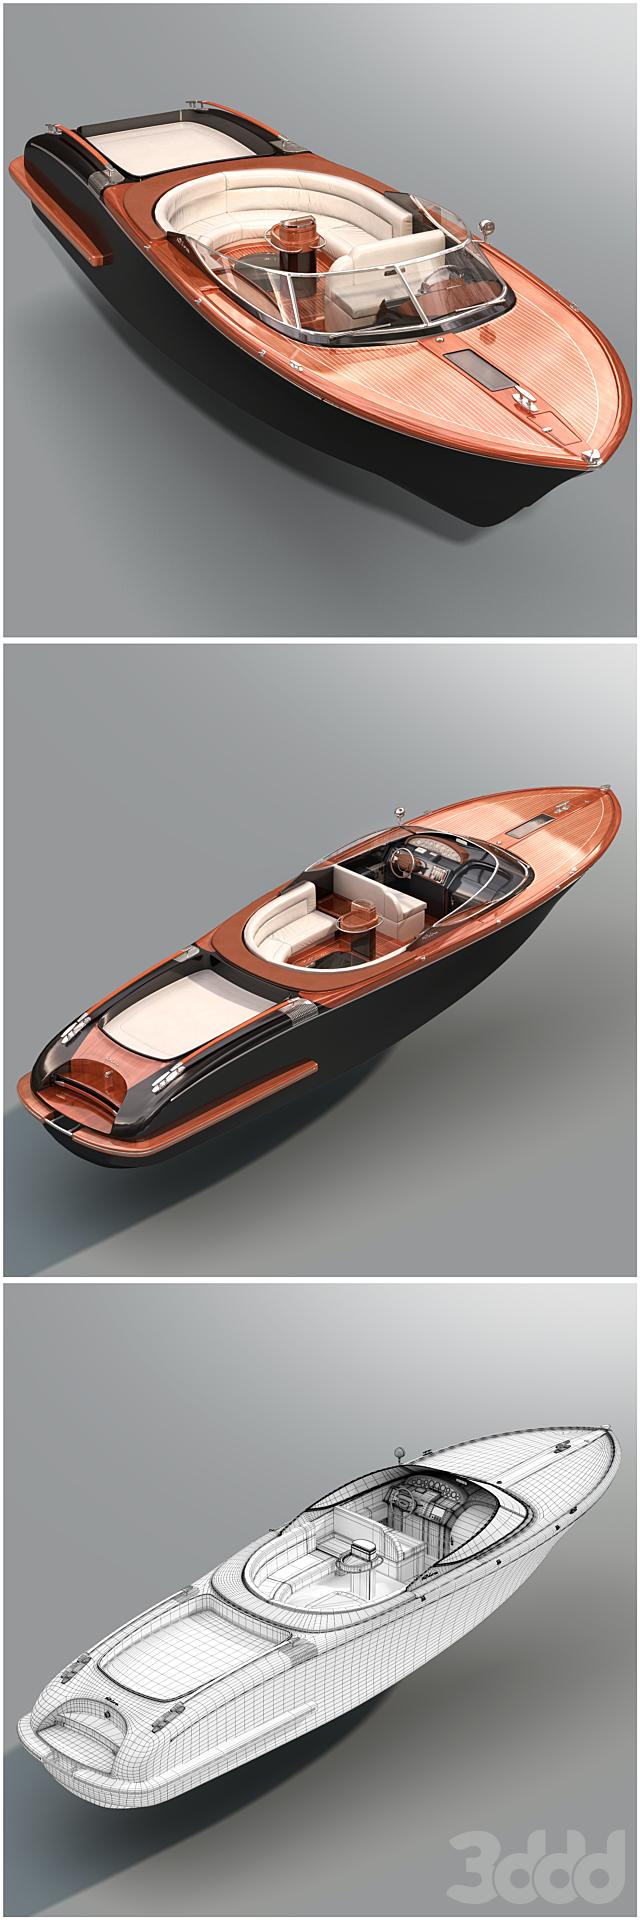 Riva Aquariva Super